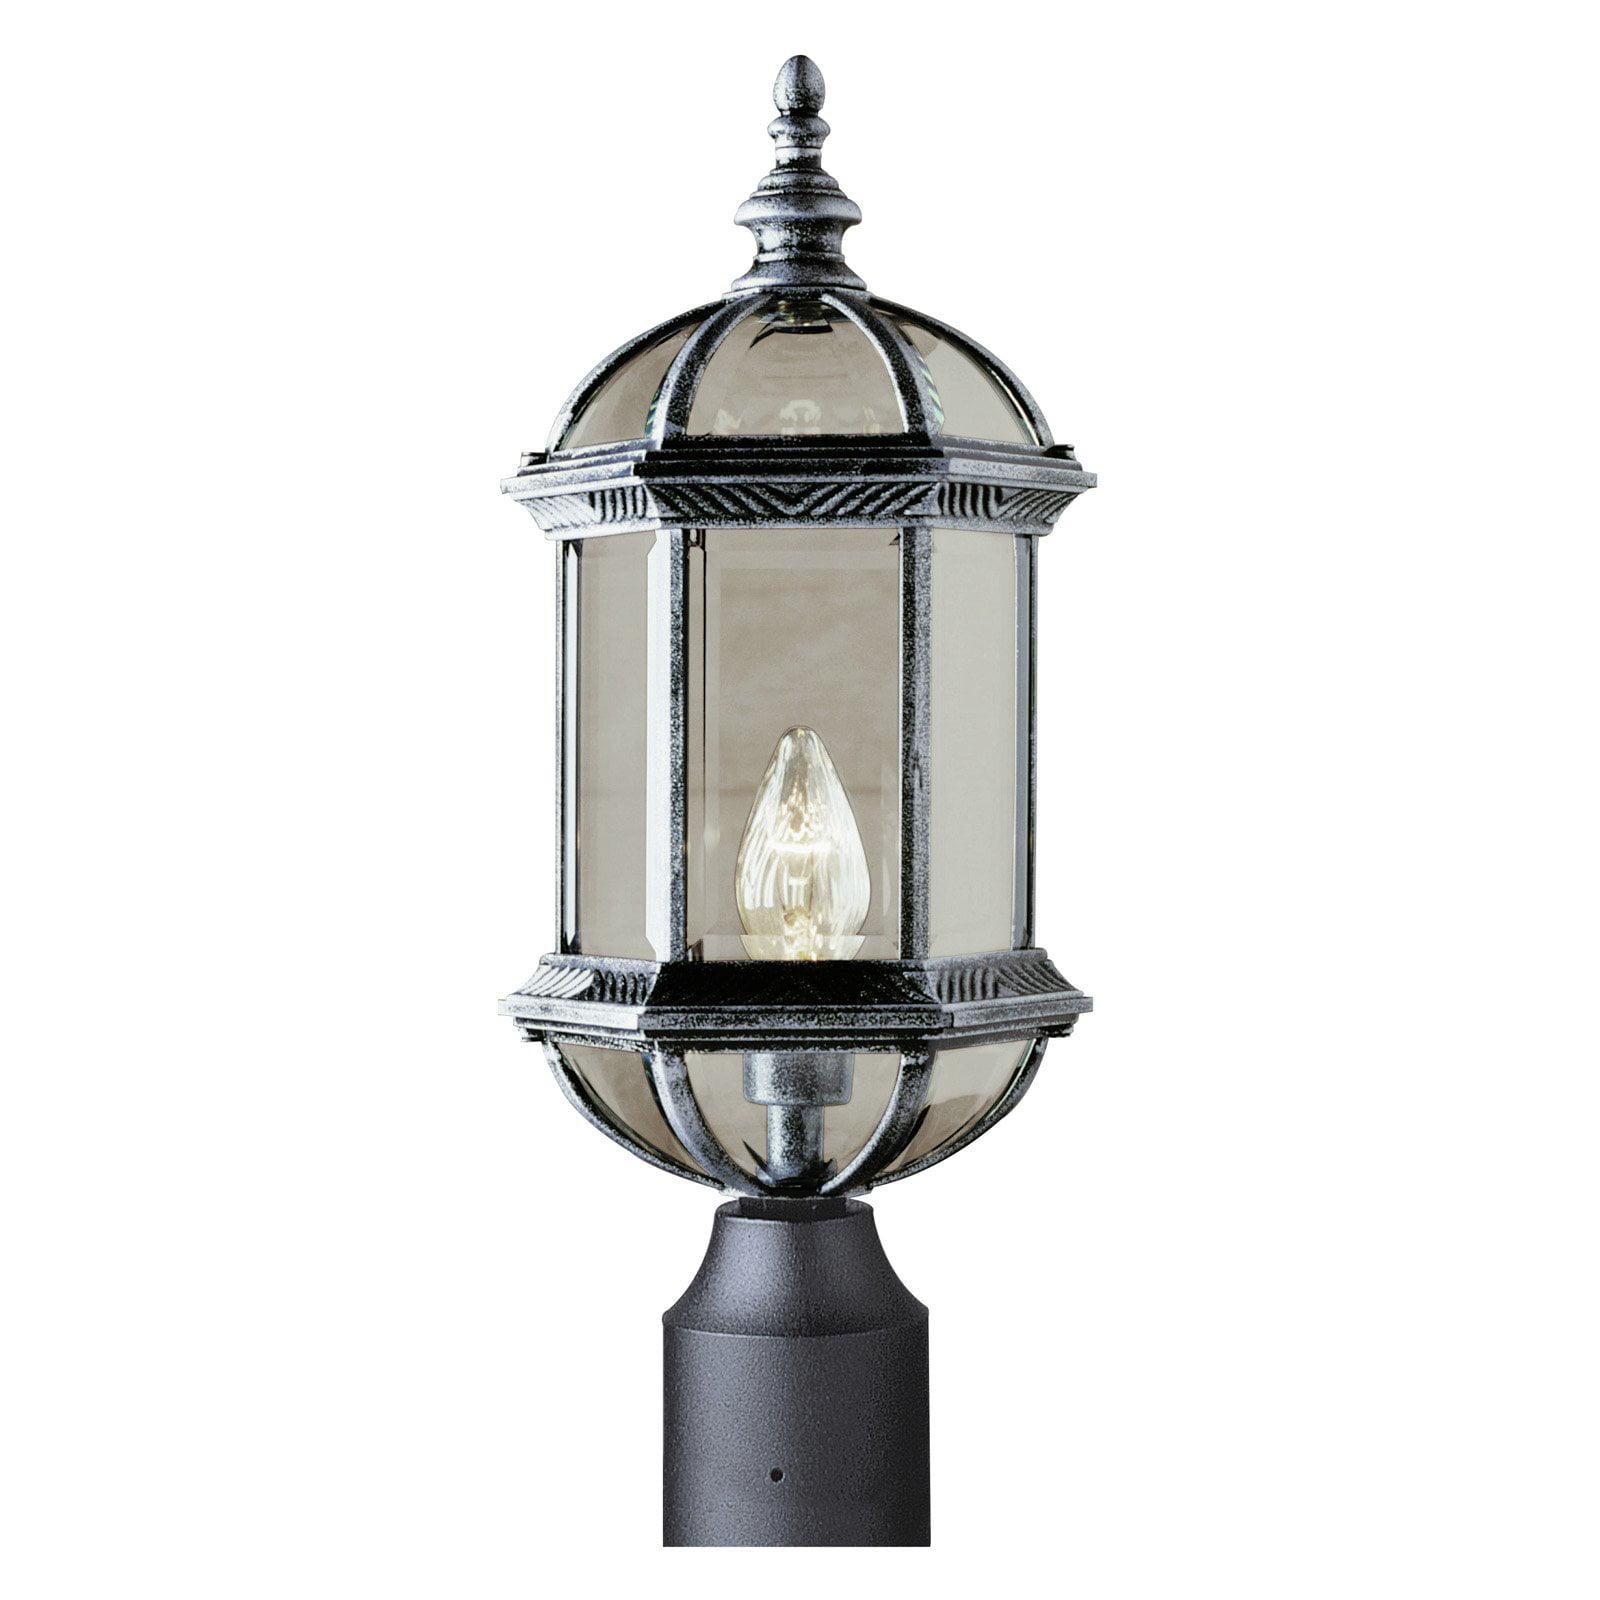 Trans Globe 4186 Post Lantern - 7.5W in.